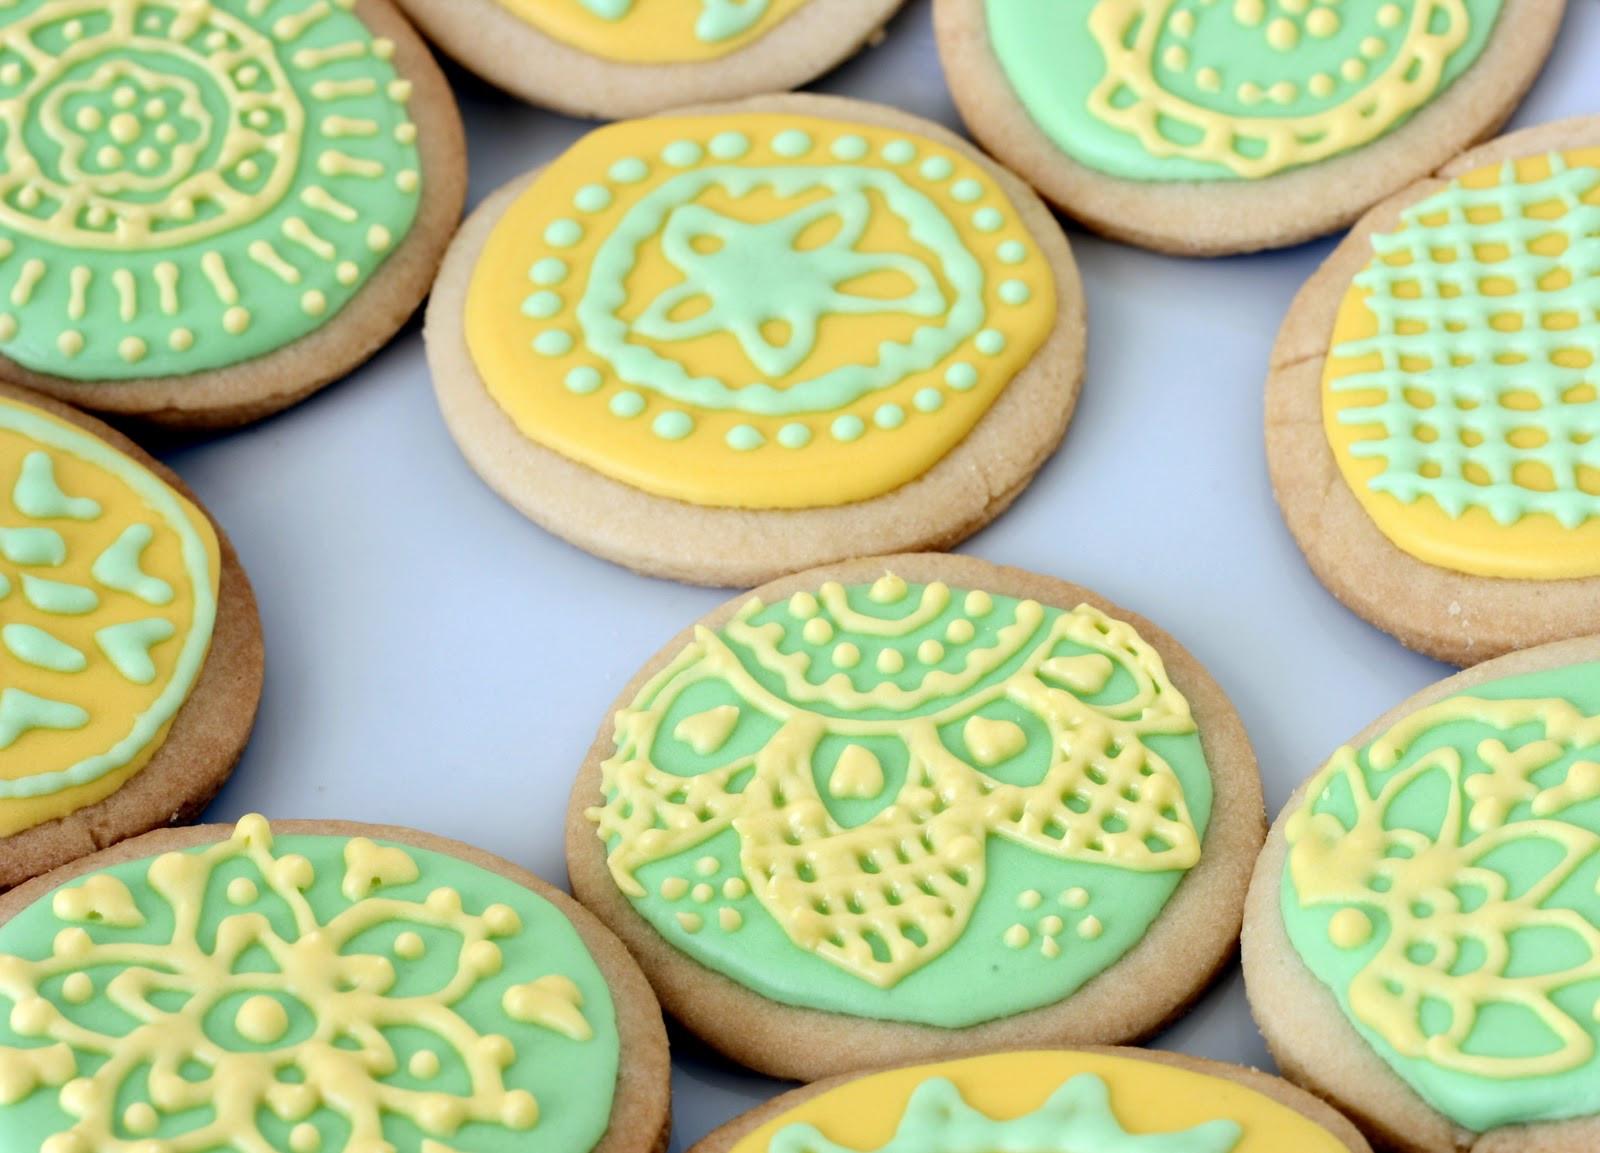 Decorated Sugar Cookies  Daring Decorated Sugar Cookies with Daring Bakers Bake Fresh